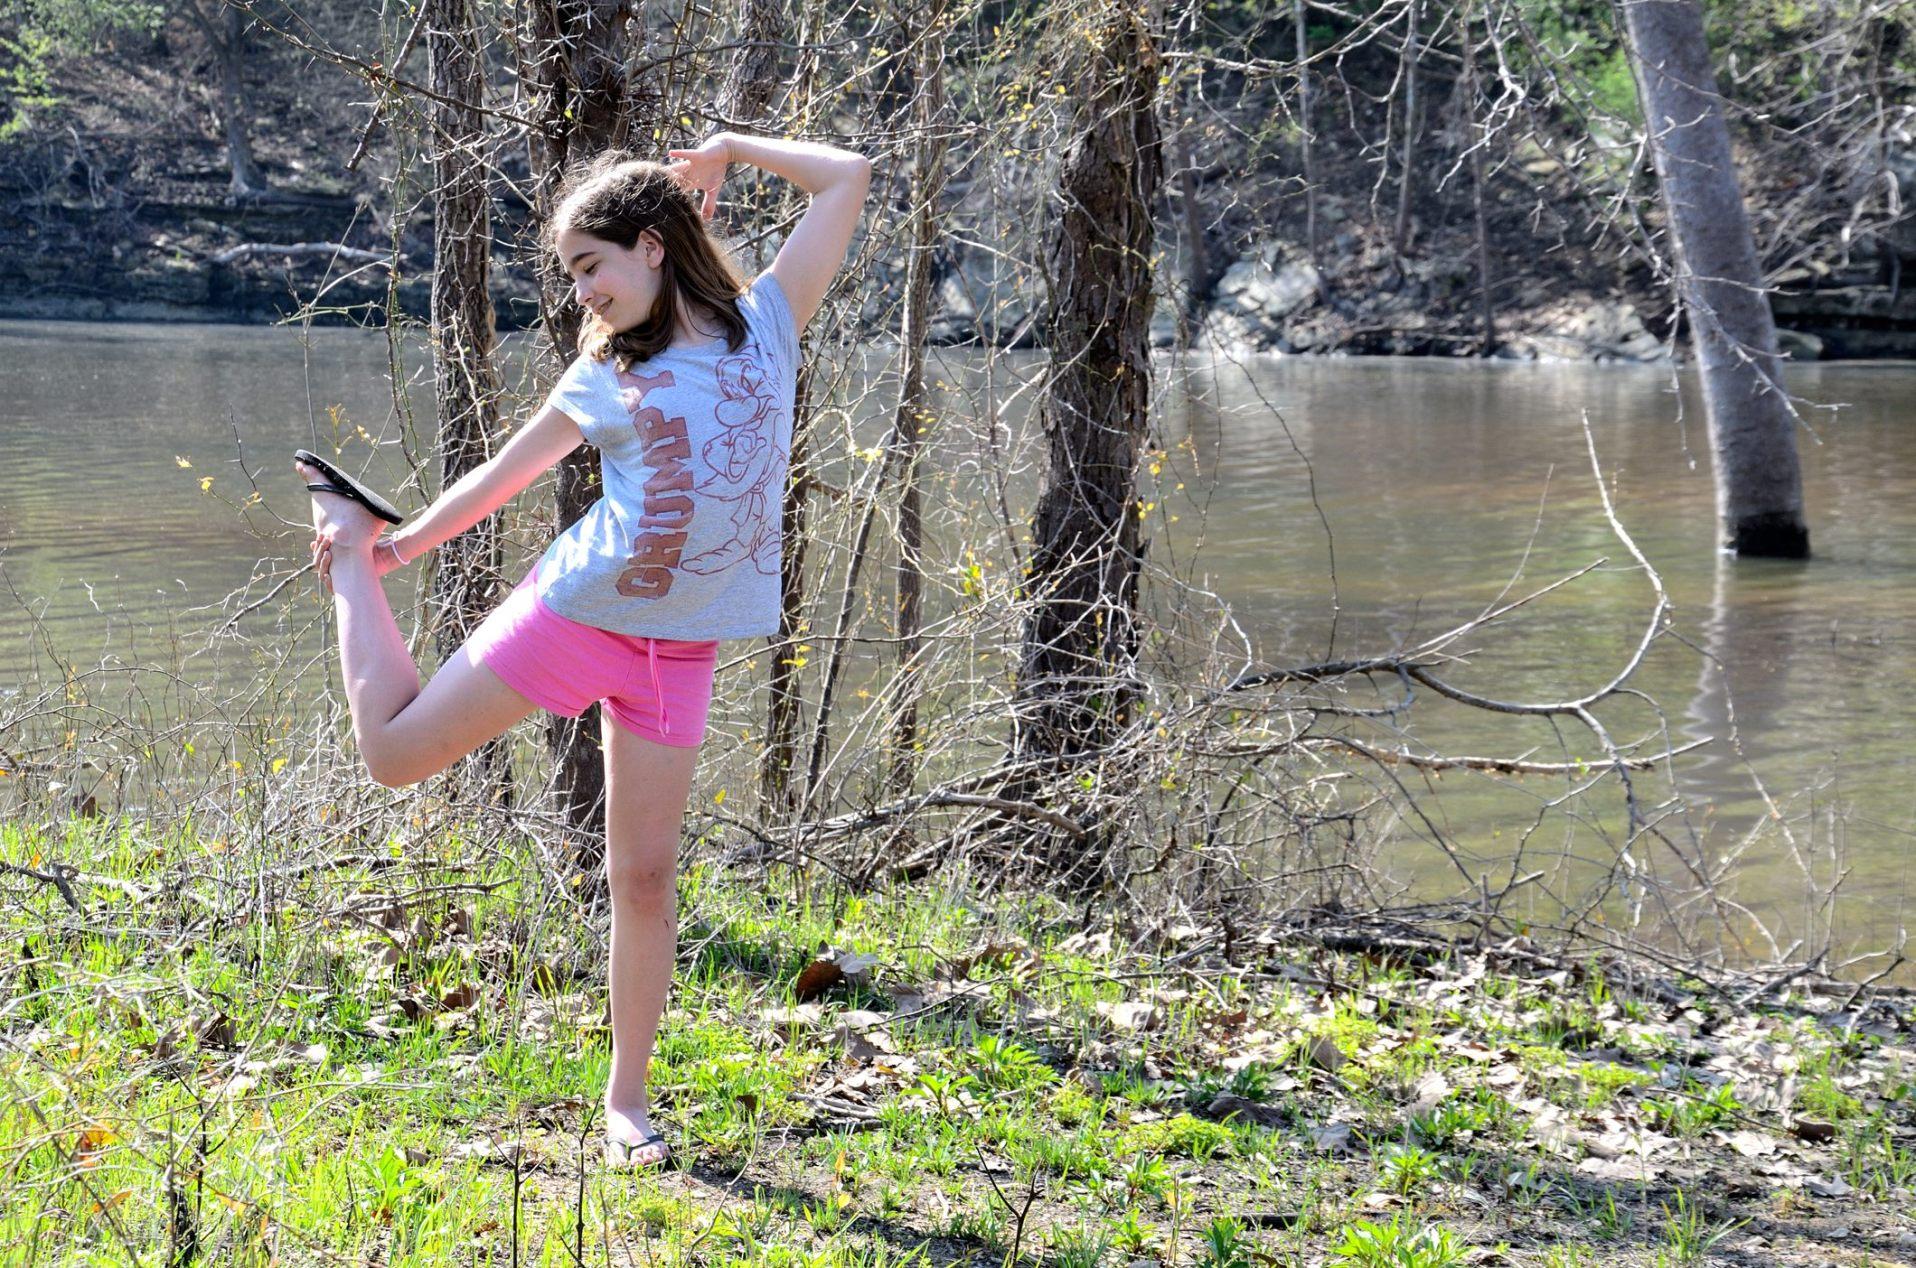 Lanie being Lanie by Piney Creek